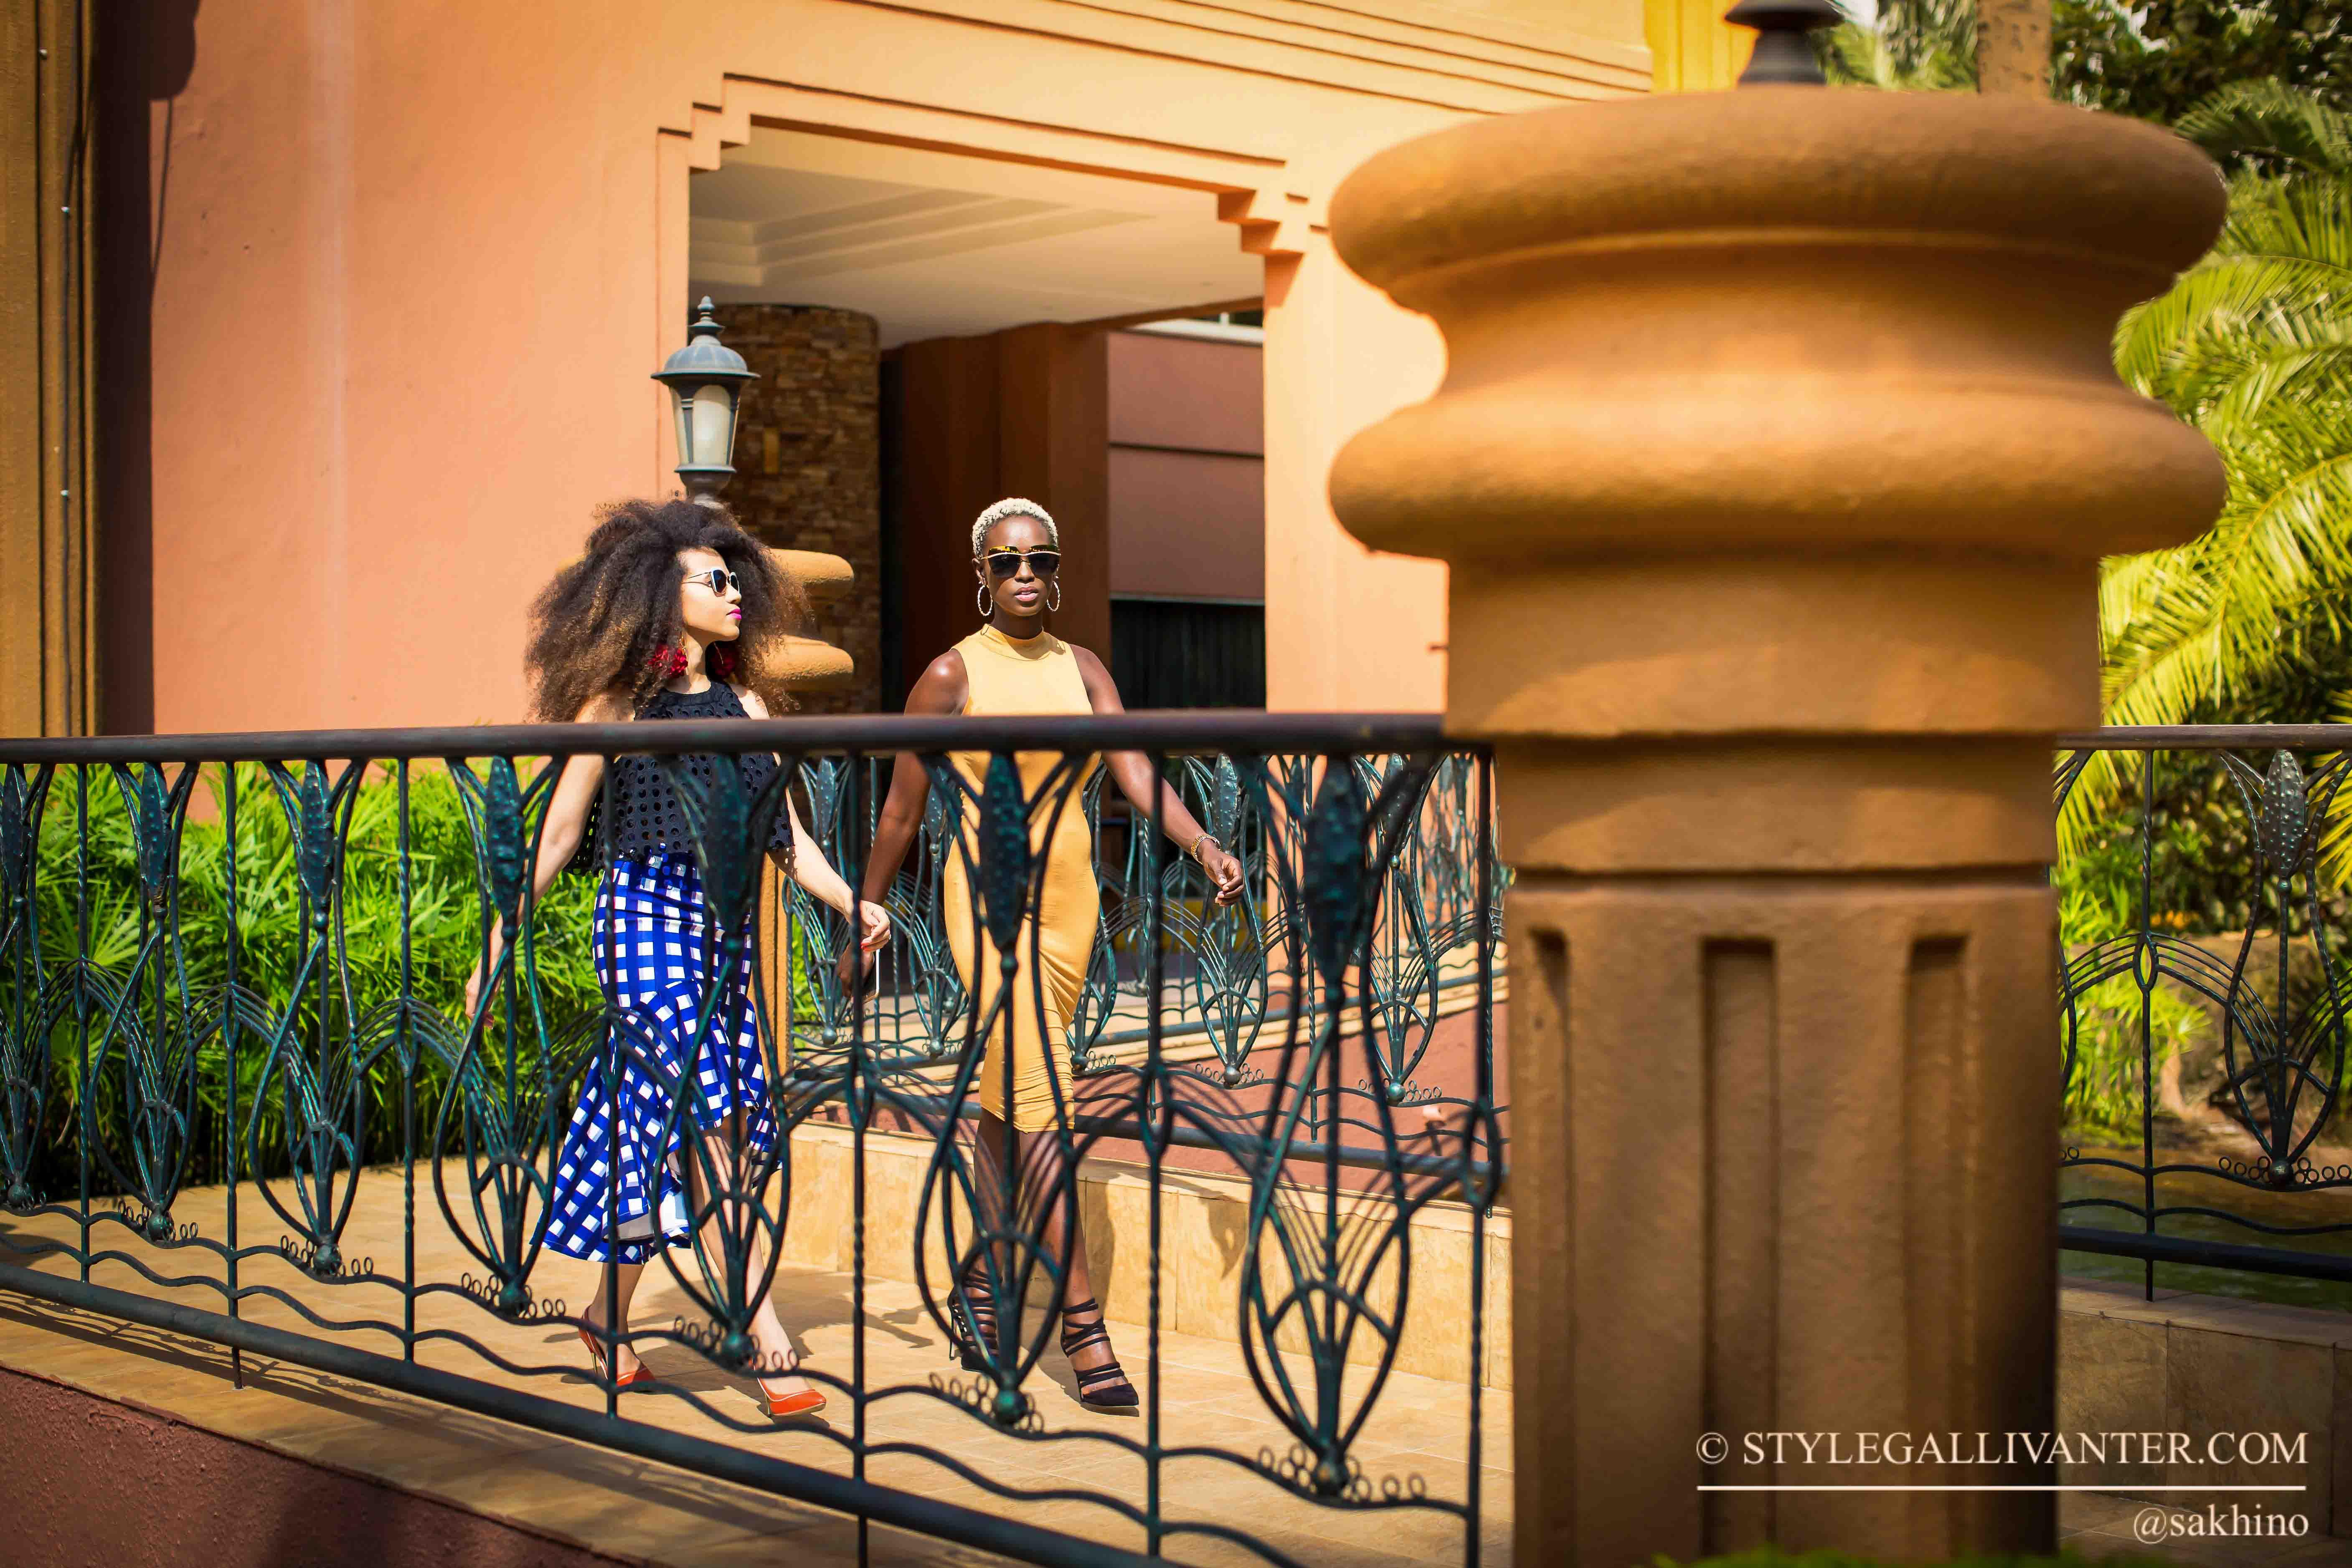 copyright-stylegallivanter.com_top-african-models_top-natural-hair-bloggers-2016_top-london-bloggers-2016_best-uk-fashion-blogs-2016-8